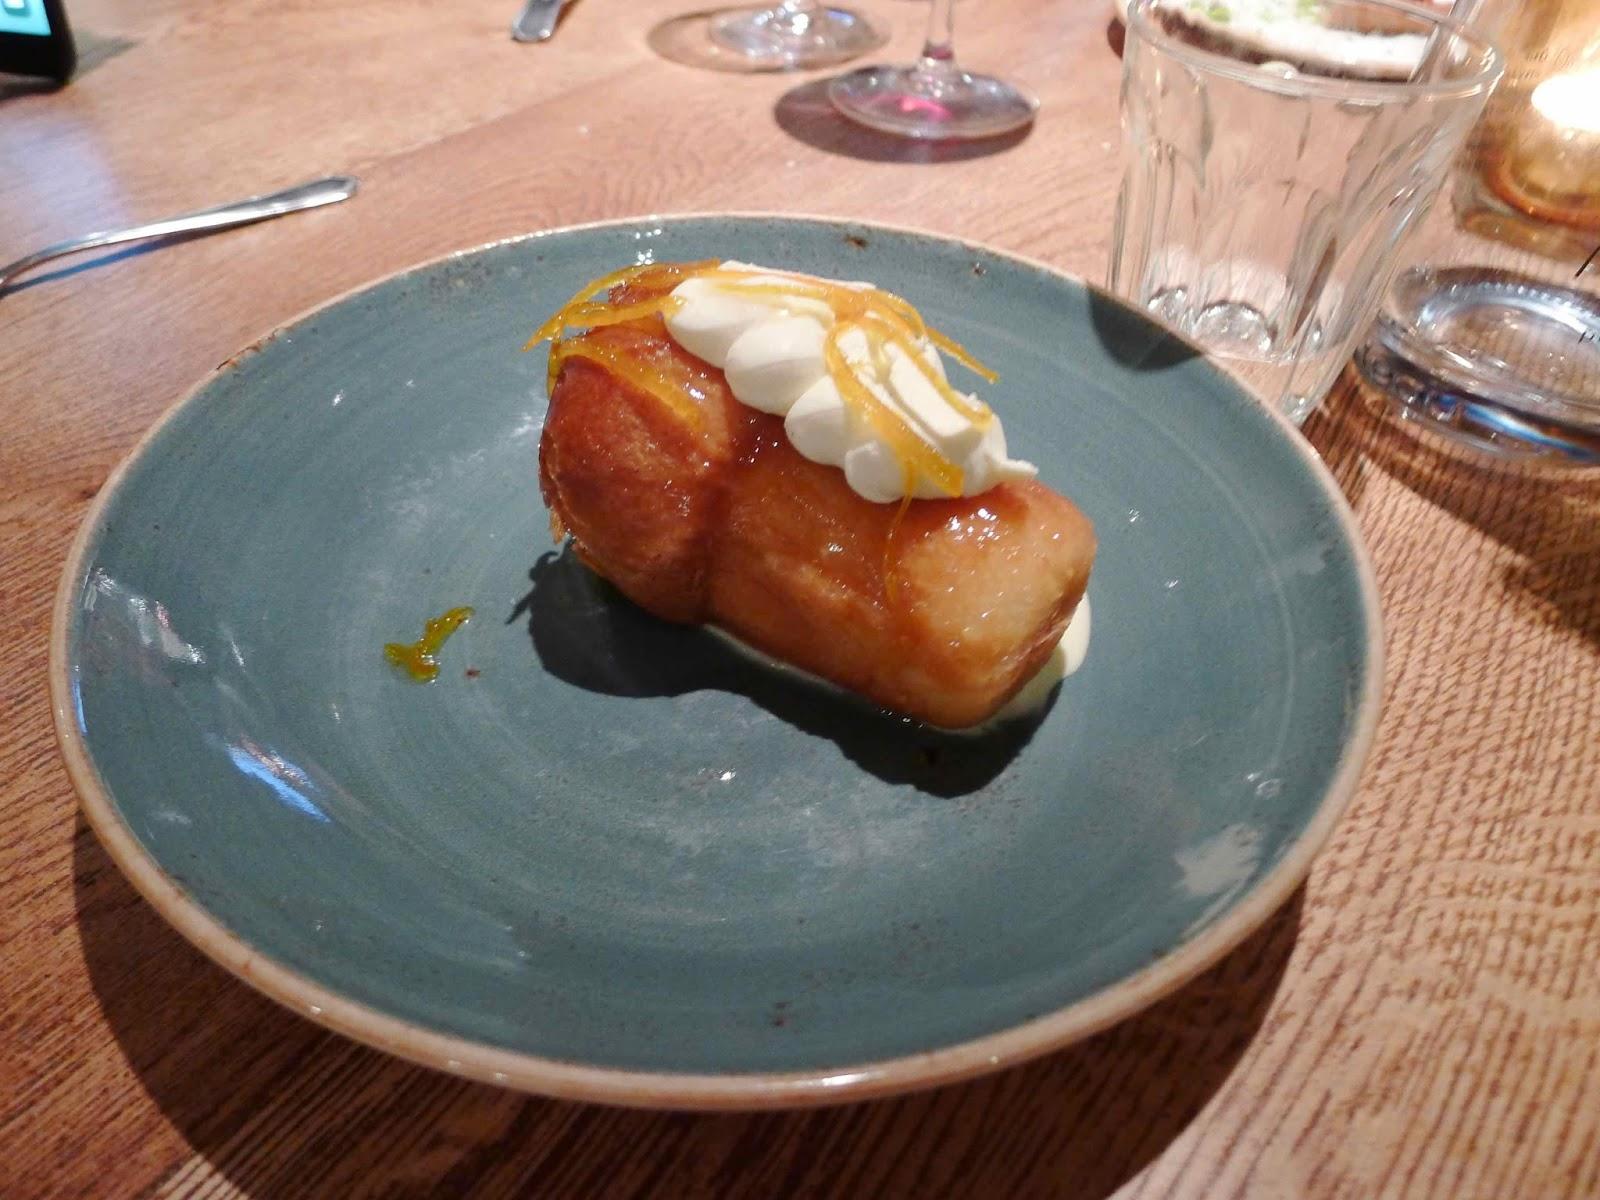 Gourmet Gorro - Cardiff food blog featuring restaurant